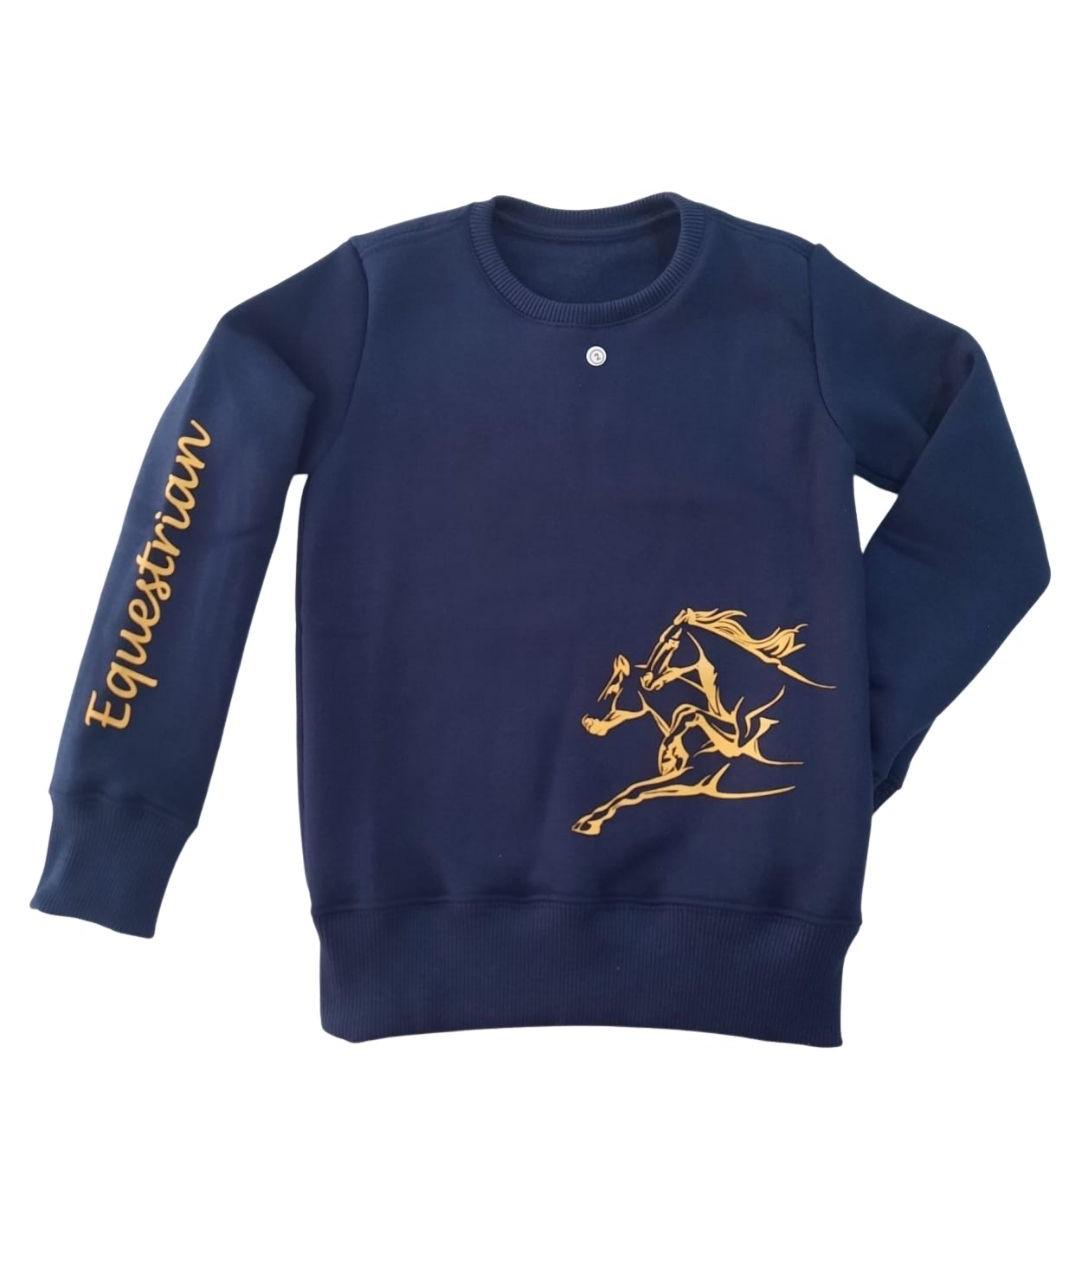 Moletom Equestrian Infantil